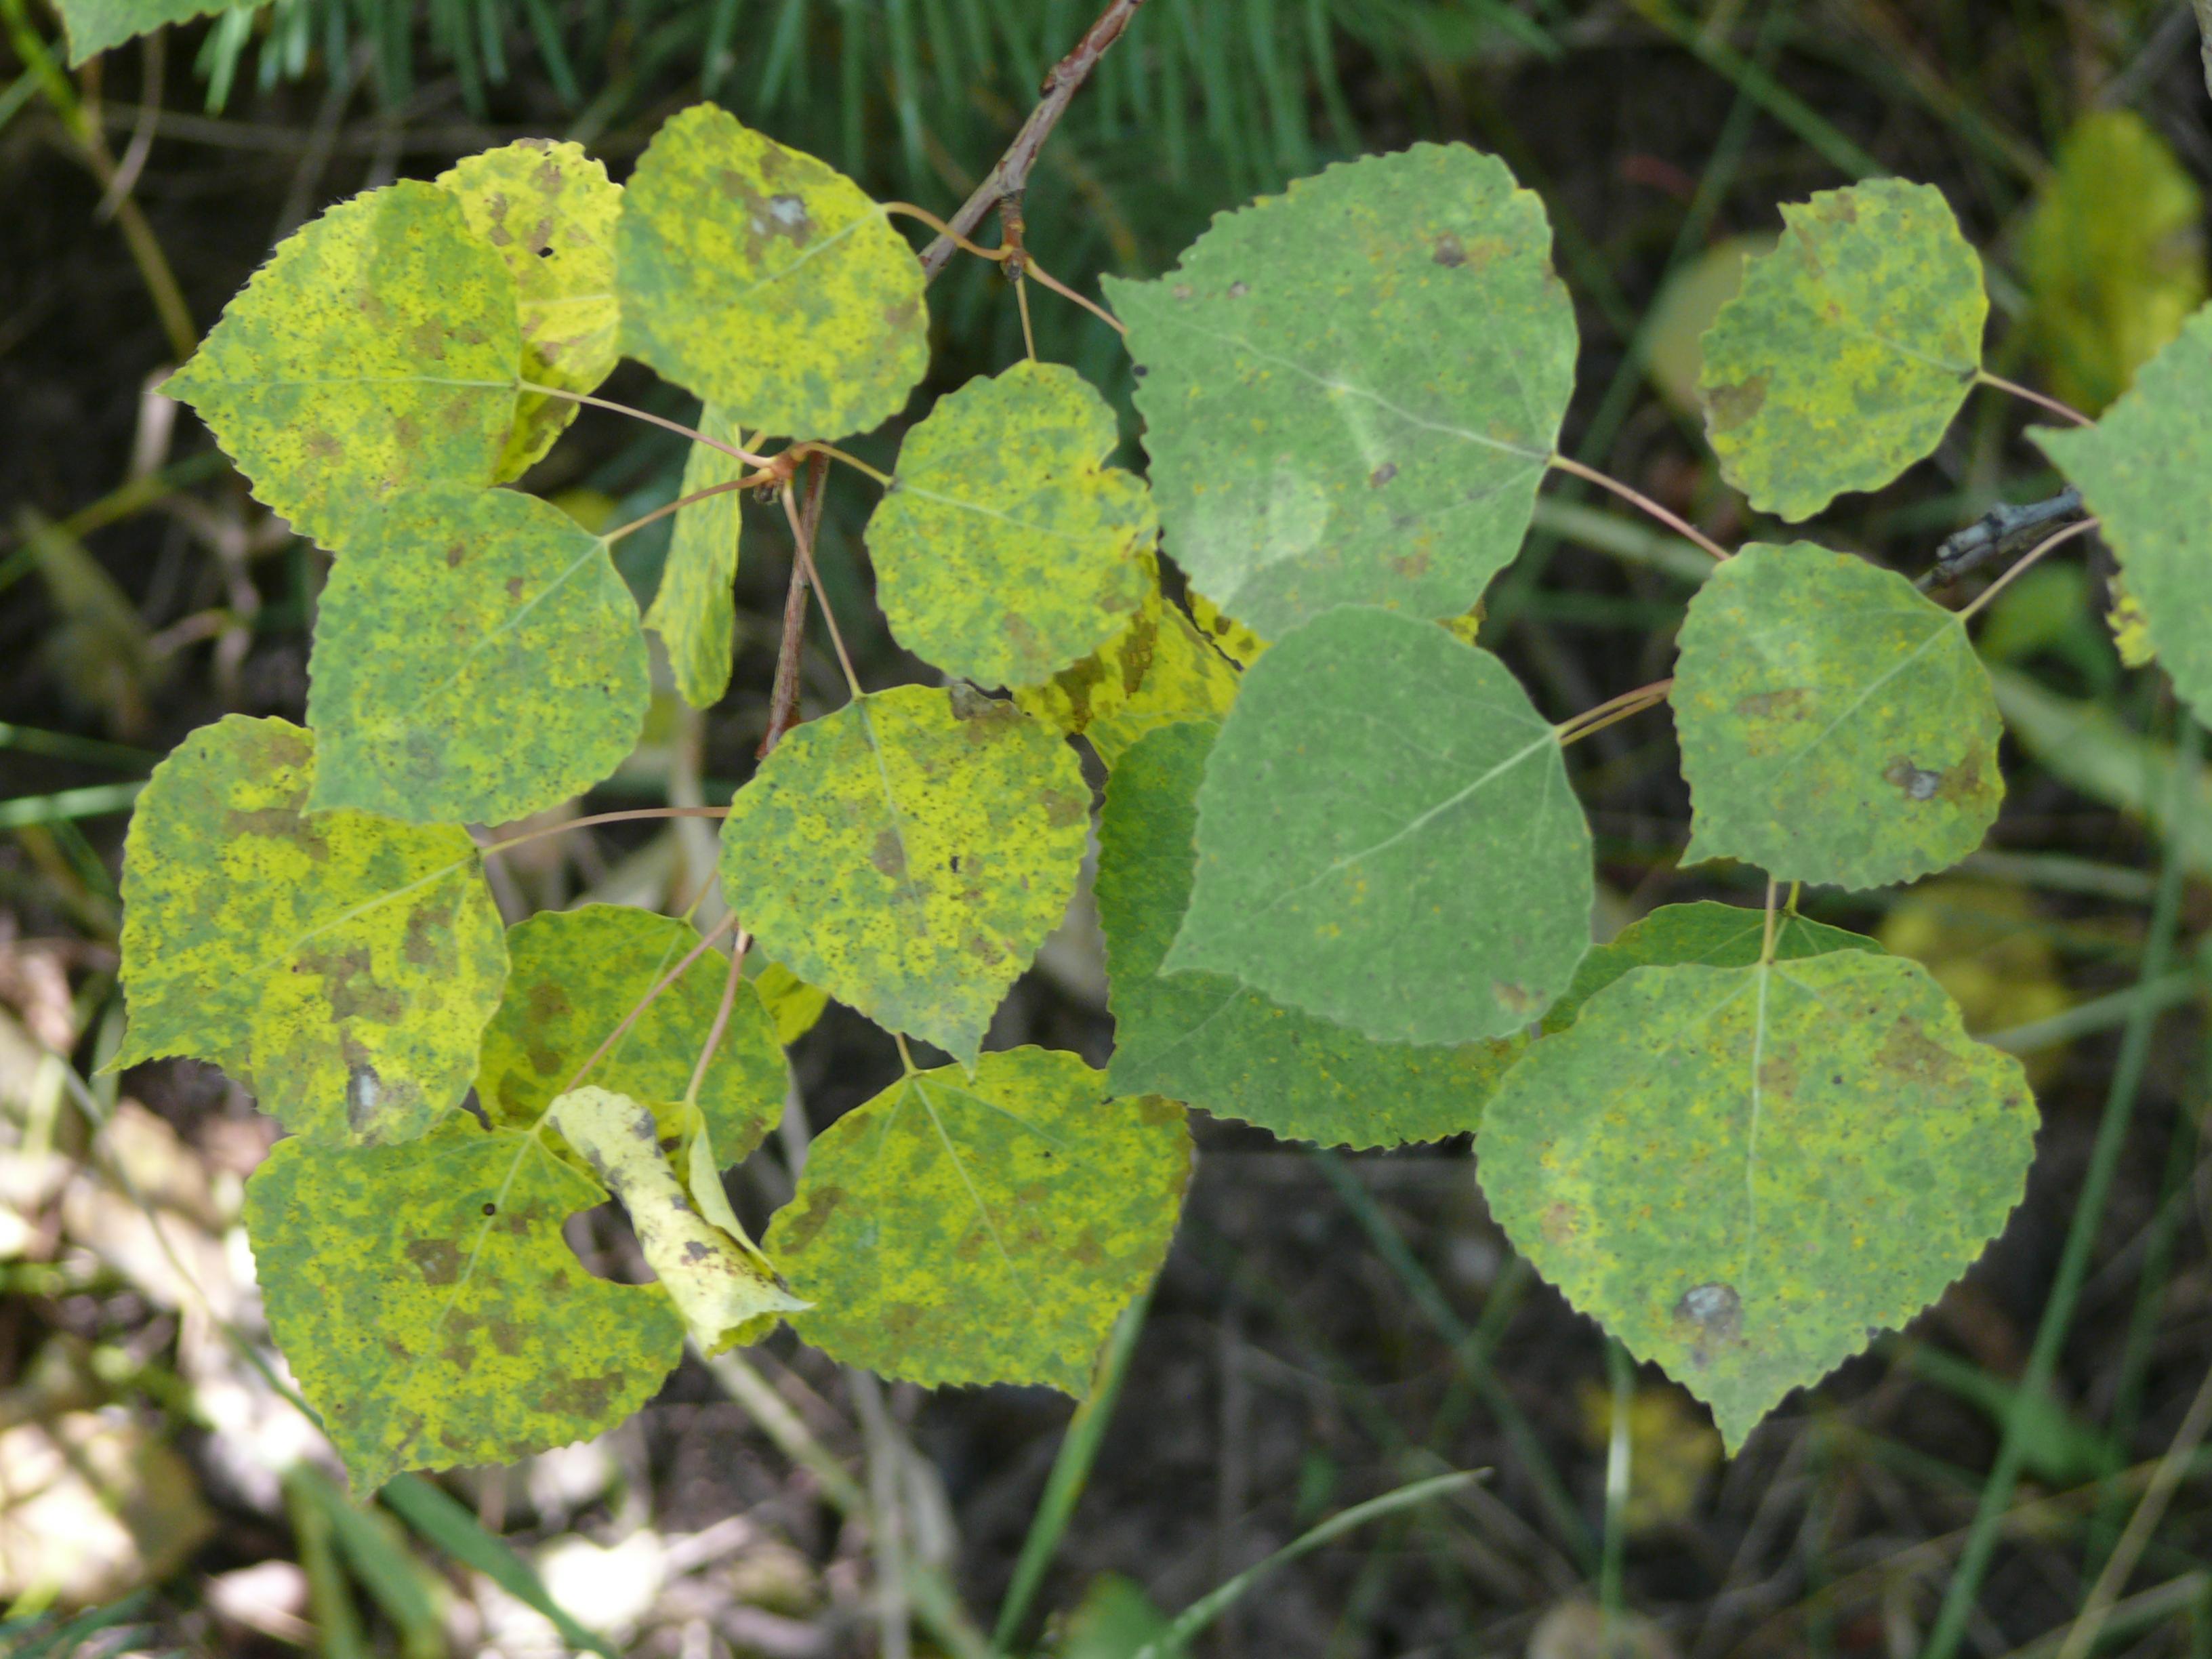 Aspen Leaves along the trail